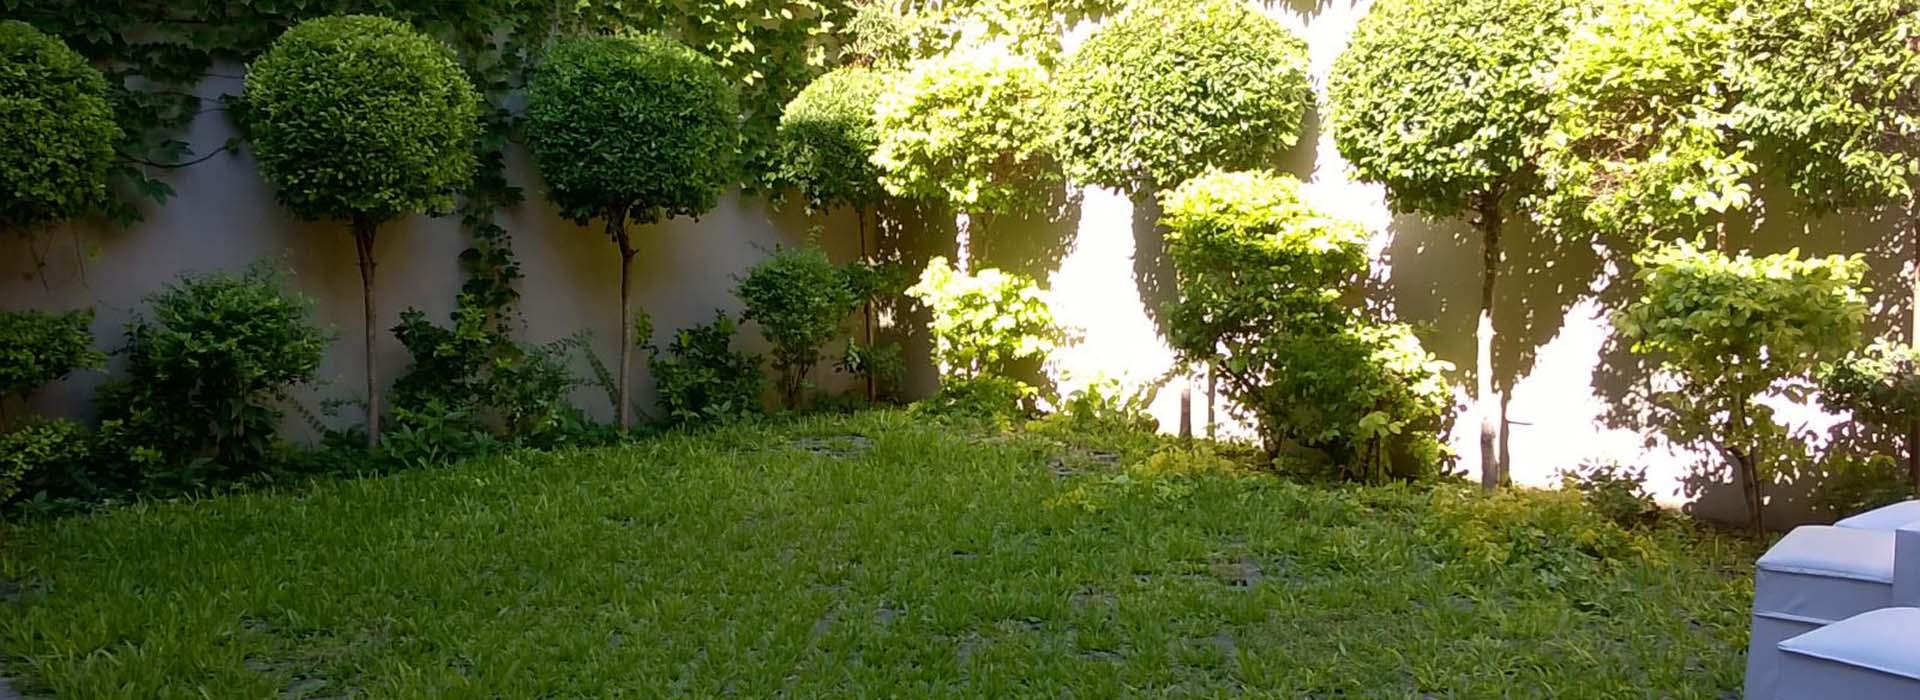 Espacio Amenabar Jardin